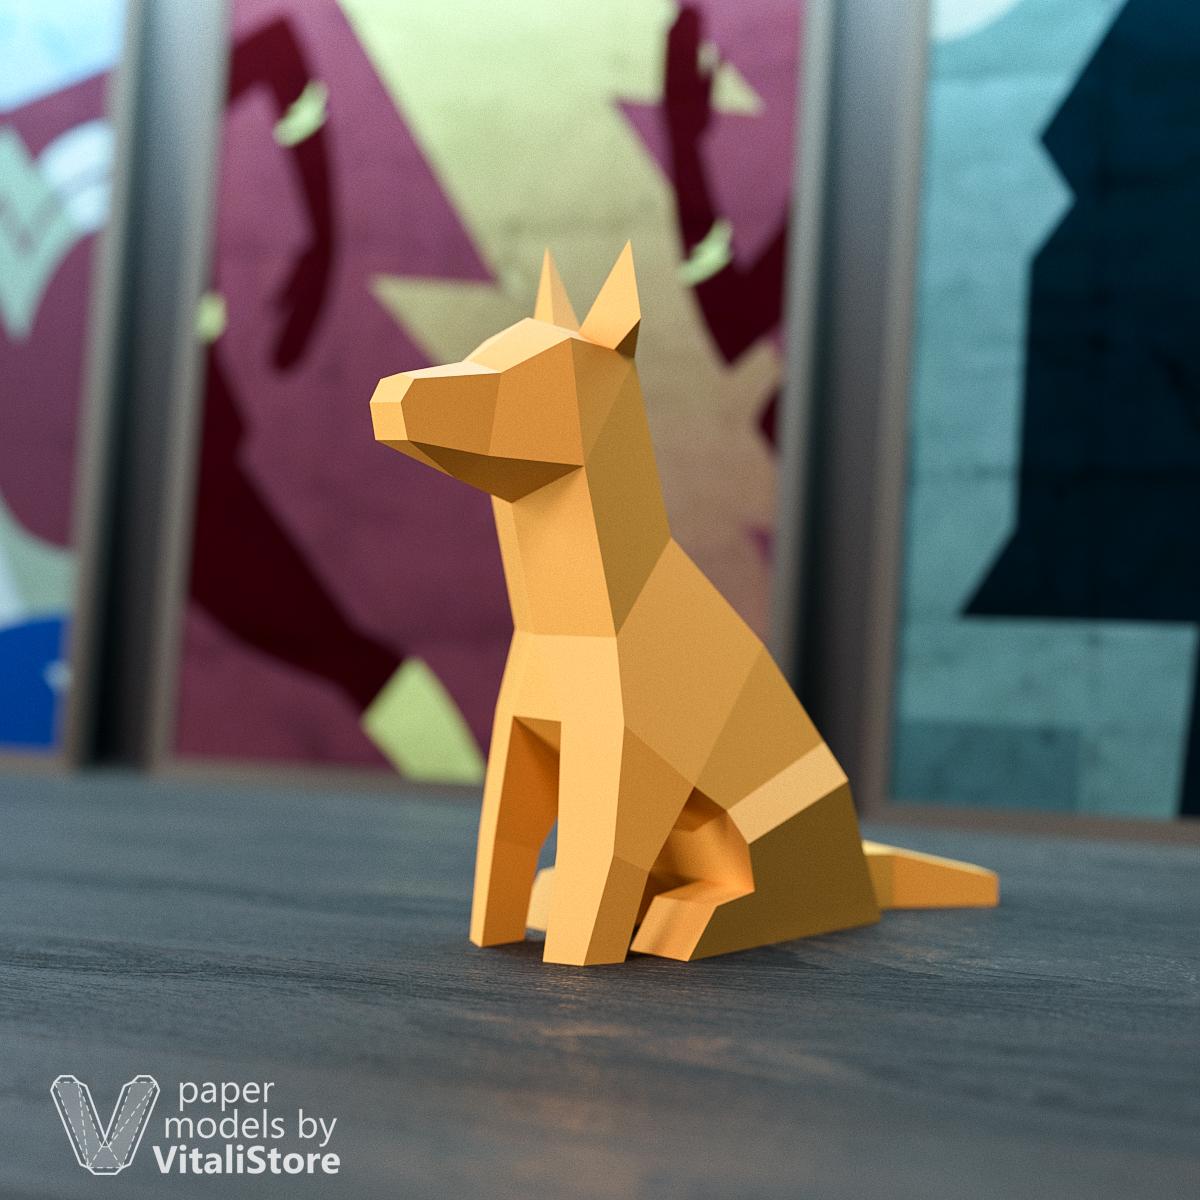 Dog Papercraft 3d Paper Sculpture Diy Gift Vitalistore